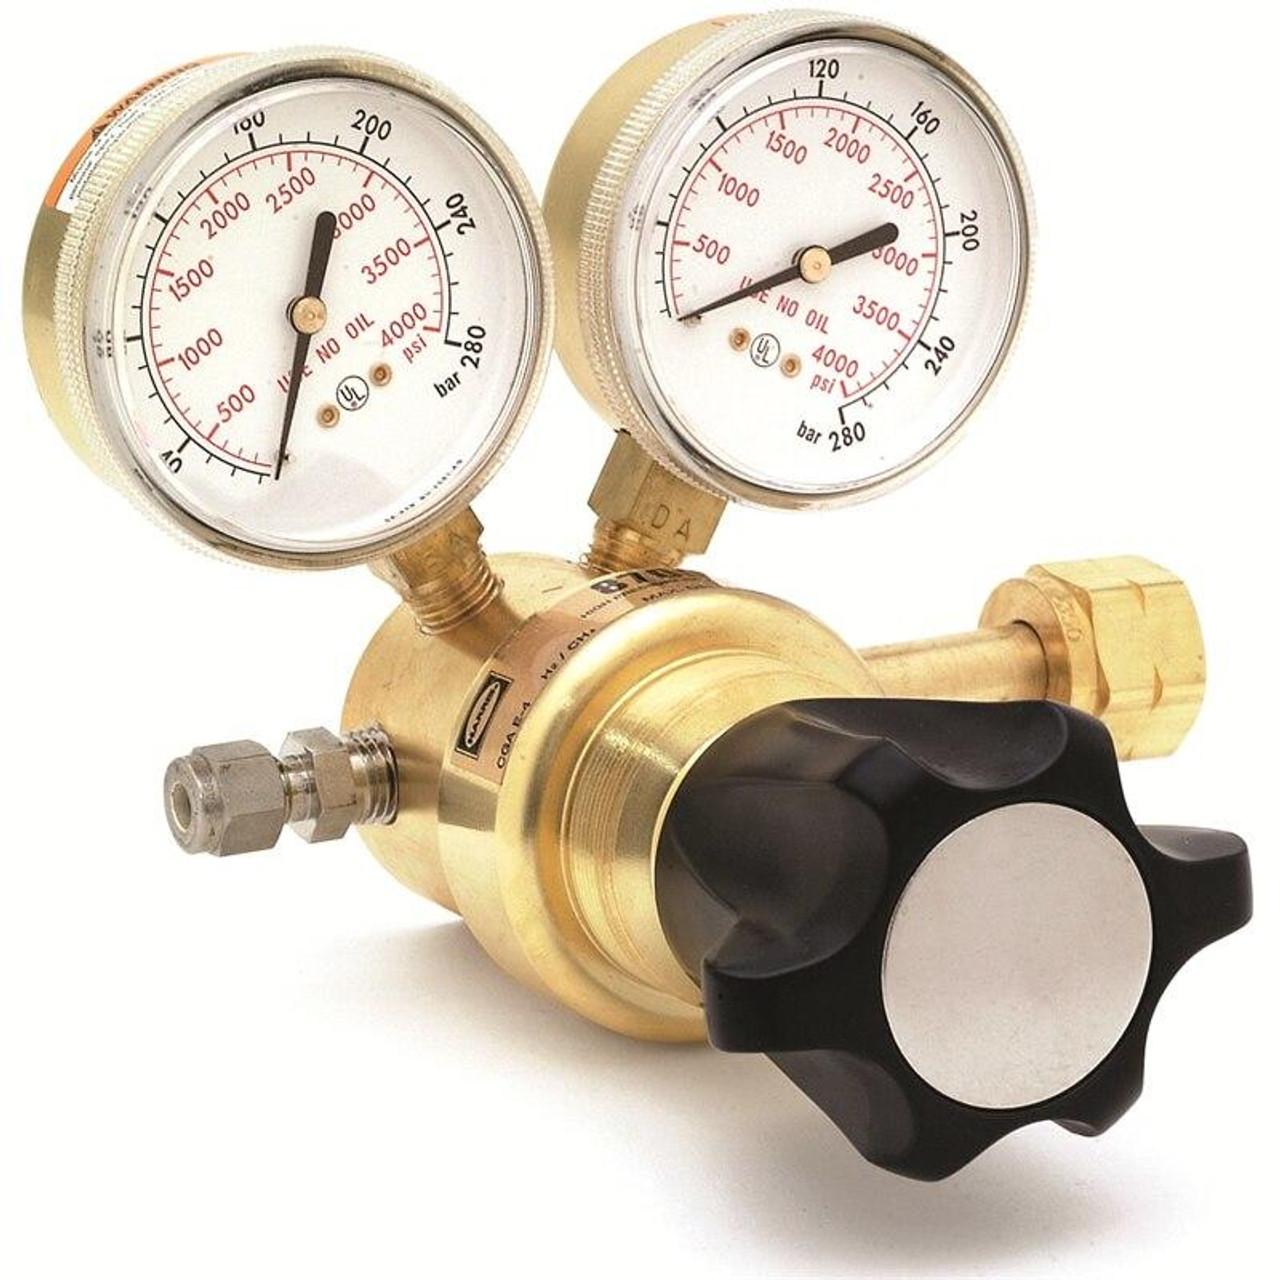 Harris Model 8700-3000-347 Medical Air Ultra High Delivery Pressure Regulator - 3200314